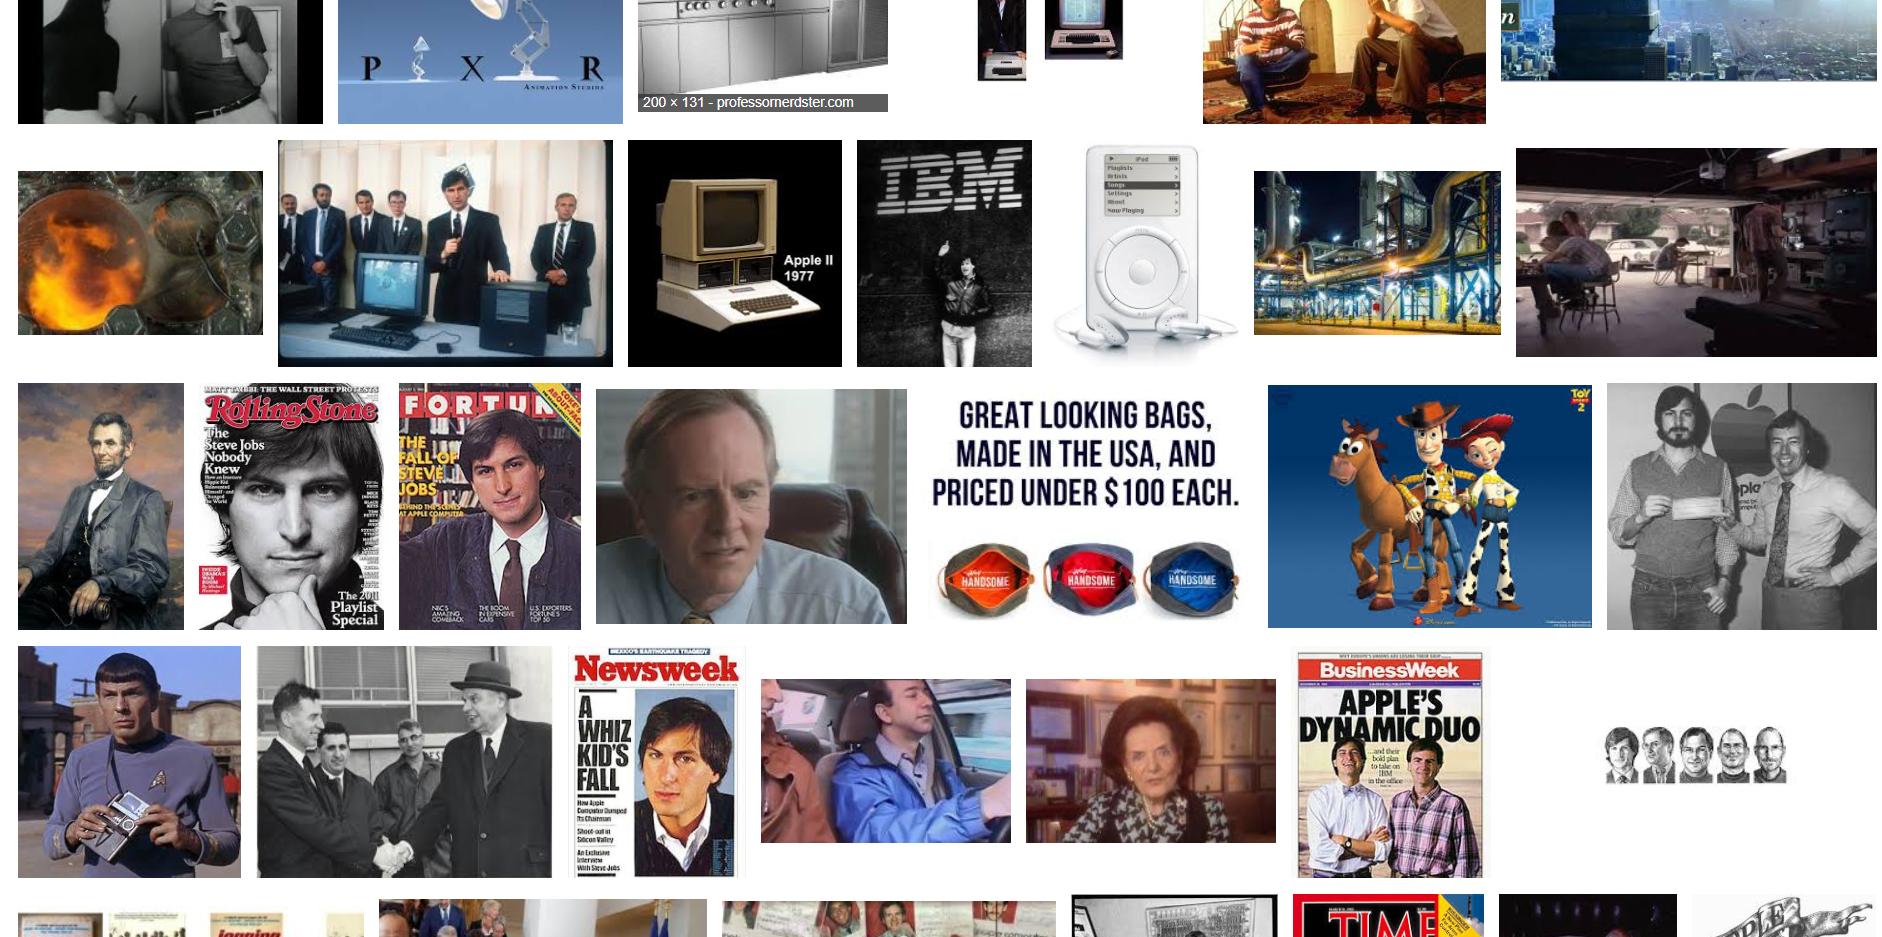 0e0fd144dfa Key takeaways from Steve Jobs' life based on Walter Isaacson's biography |  Professor Nerdster